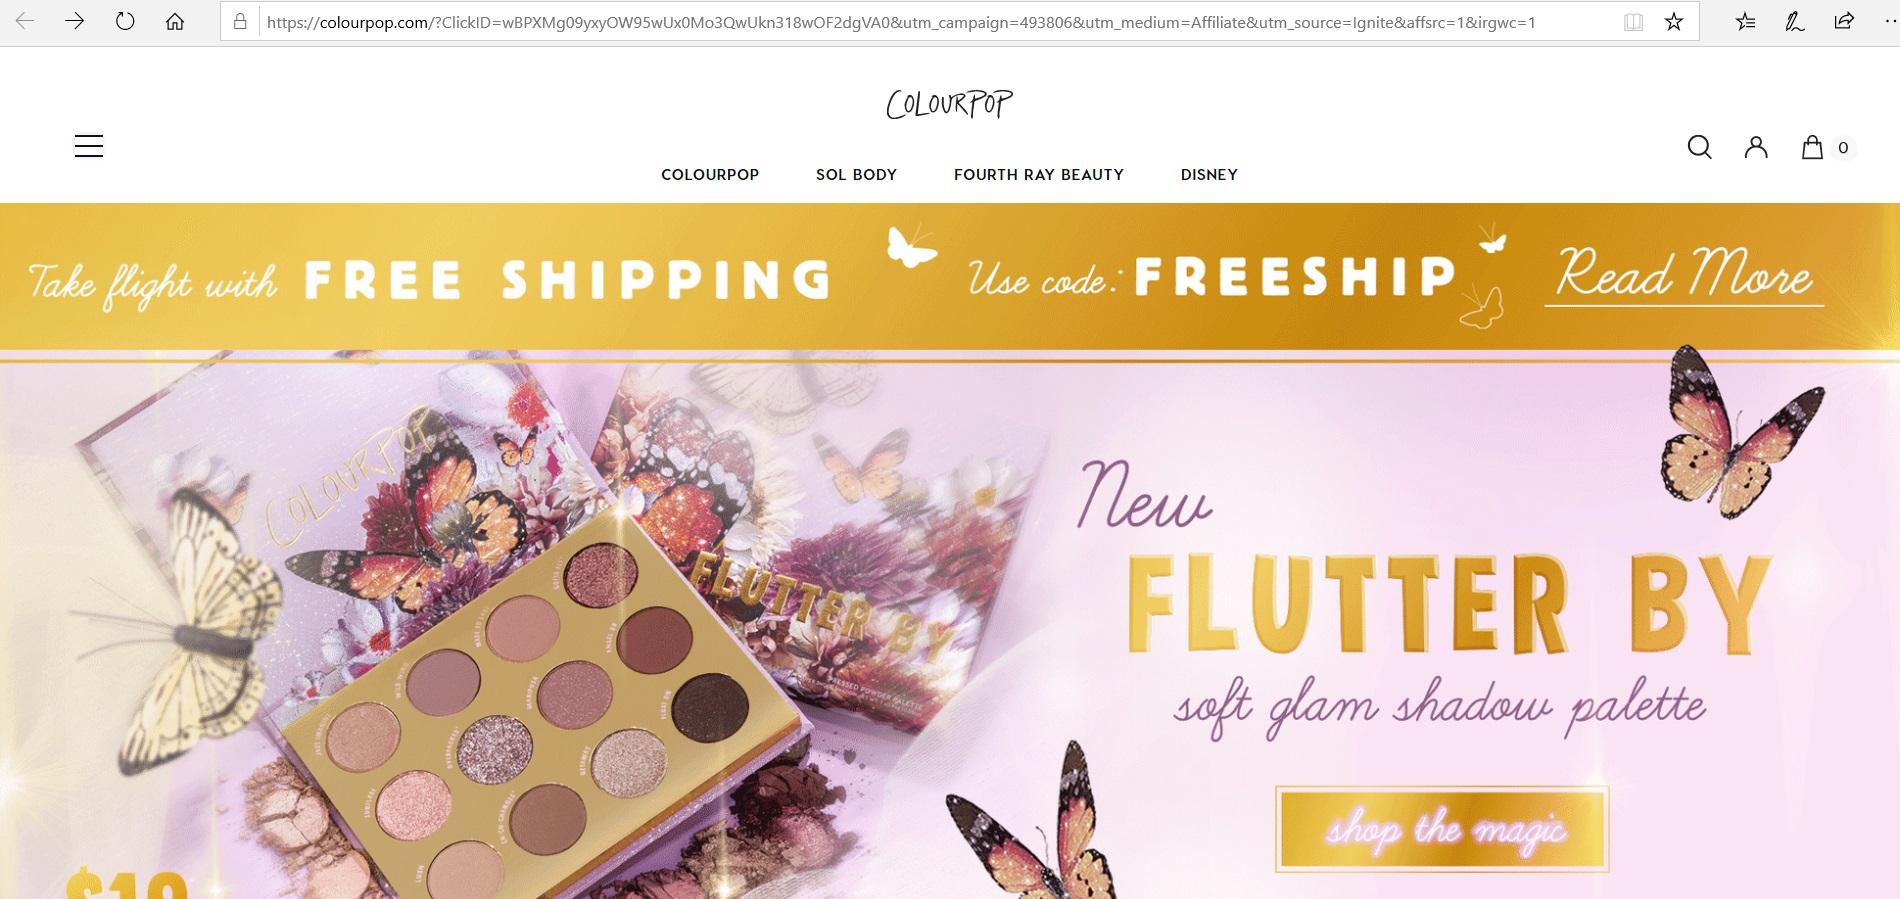 ColourPop website homepage.